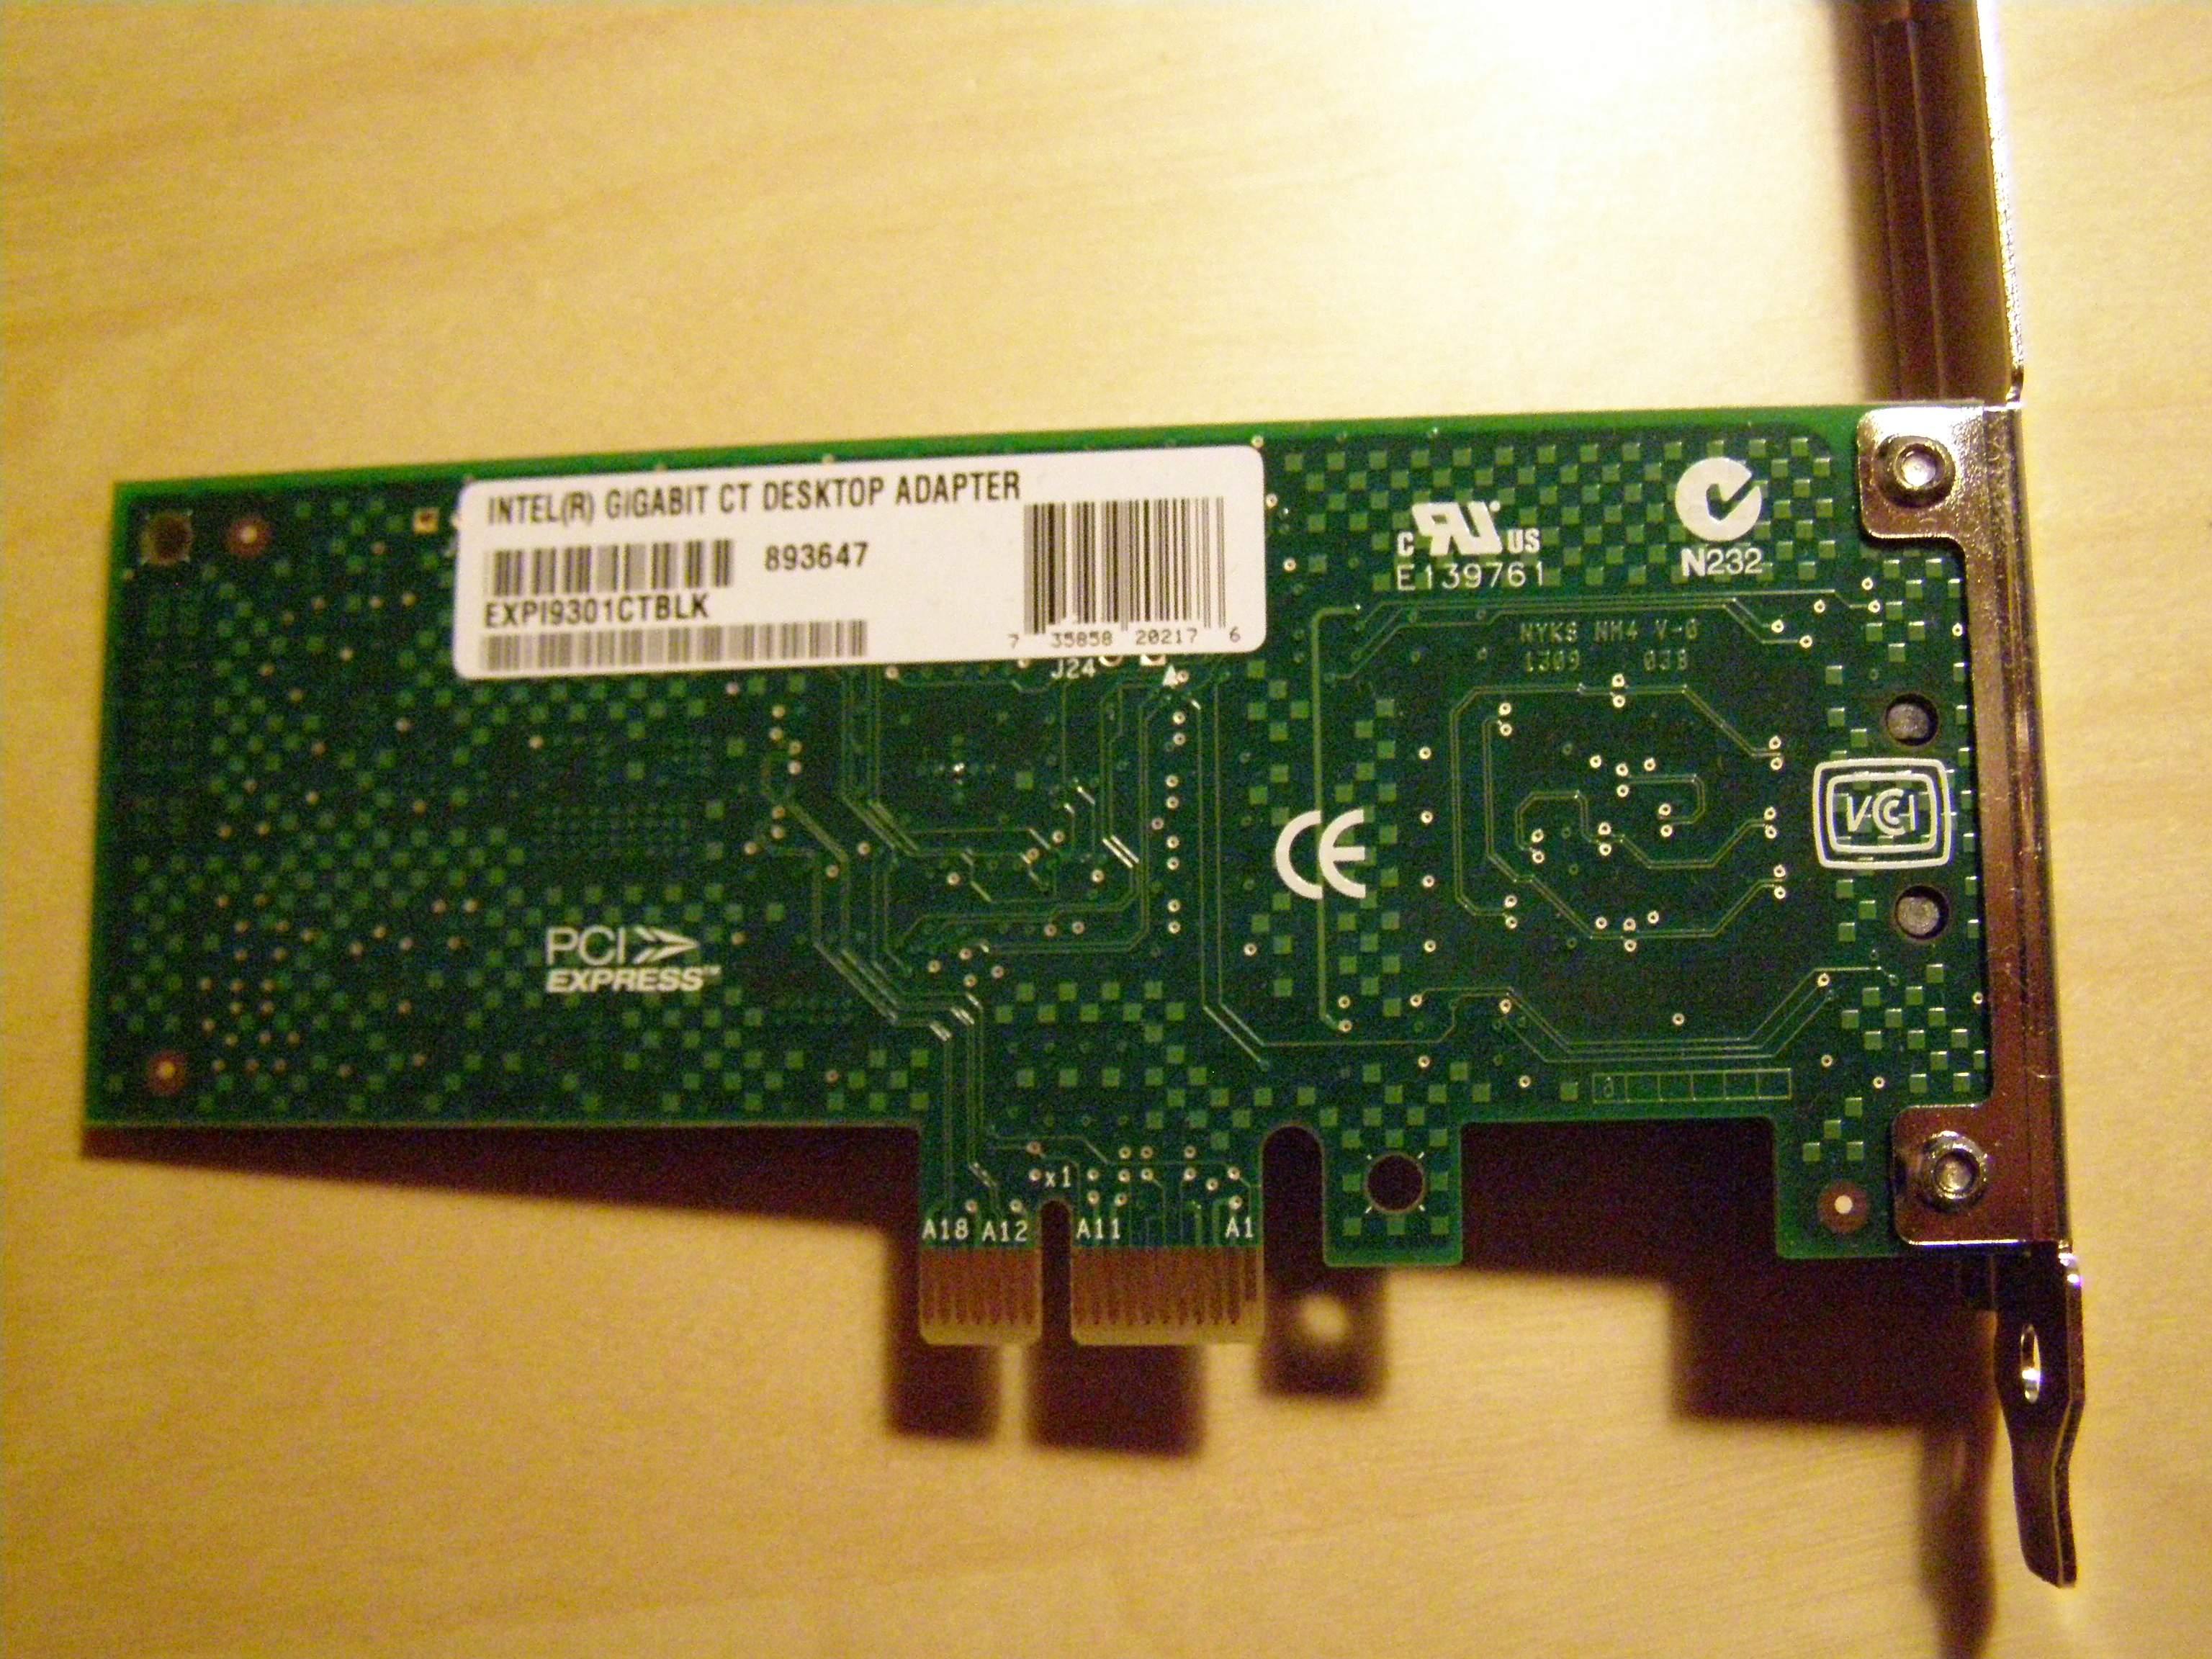 Intel 82579LM Gigabit Ethernet PHY